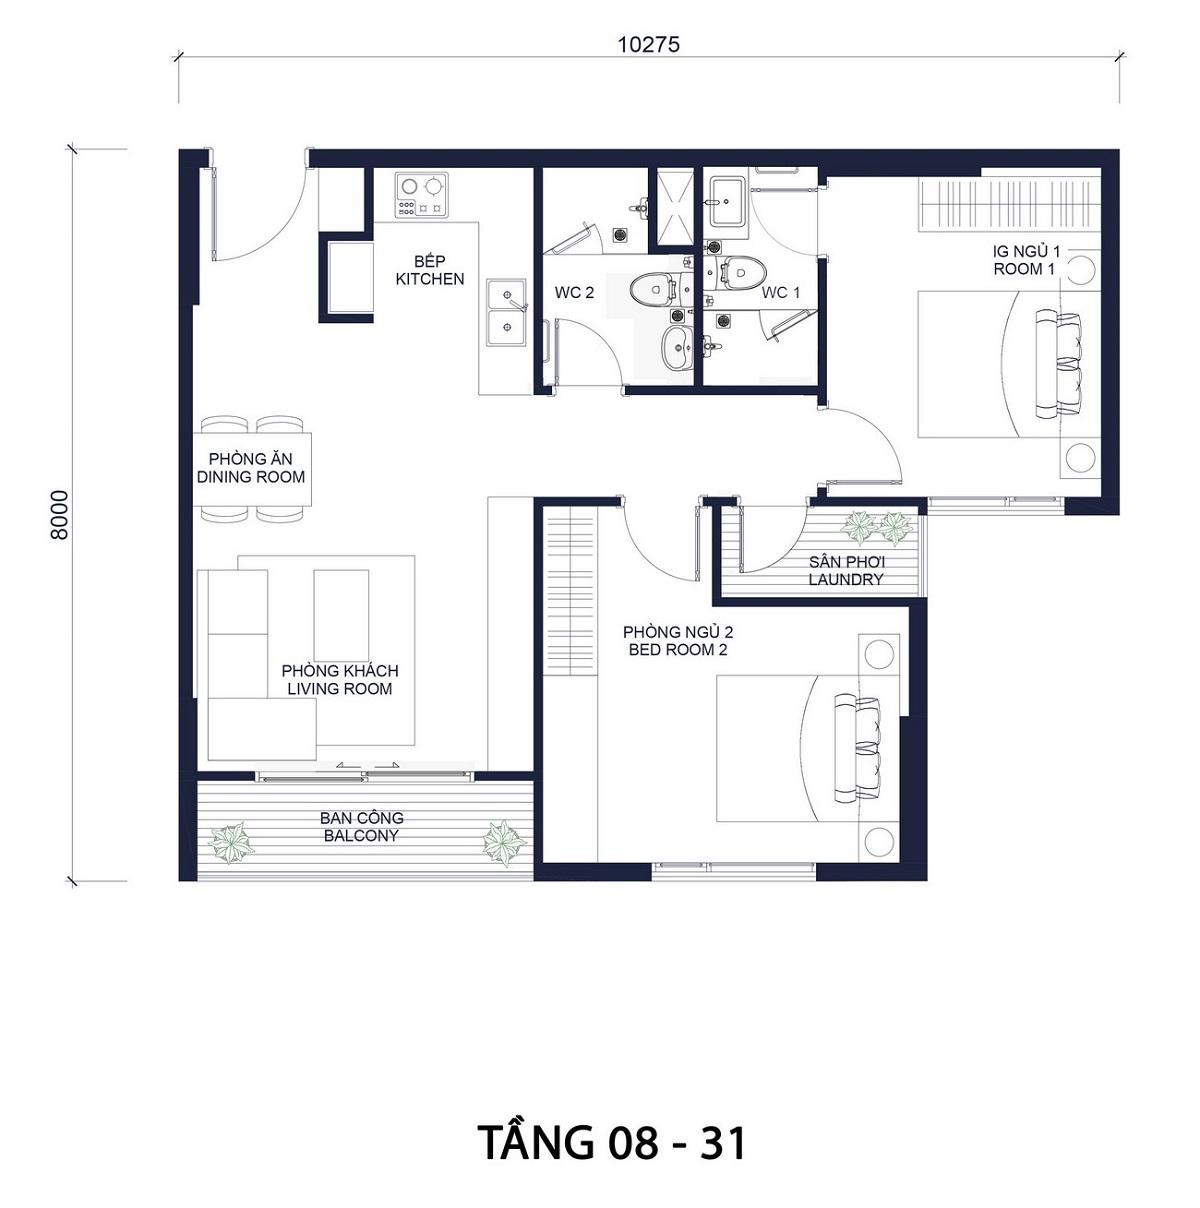 thiet-ke-tang-8-31-2pn-du-an-millennium